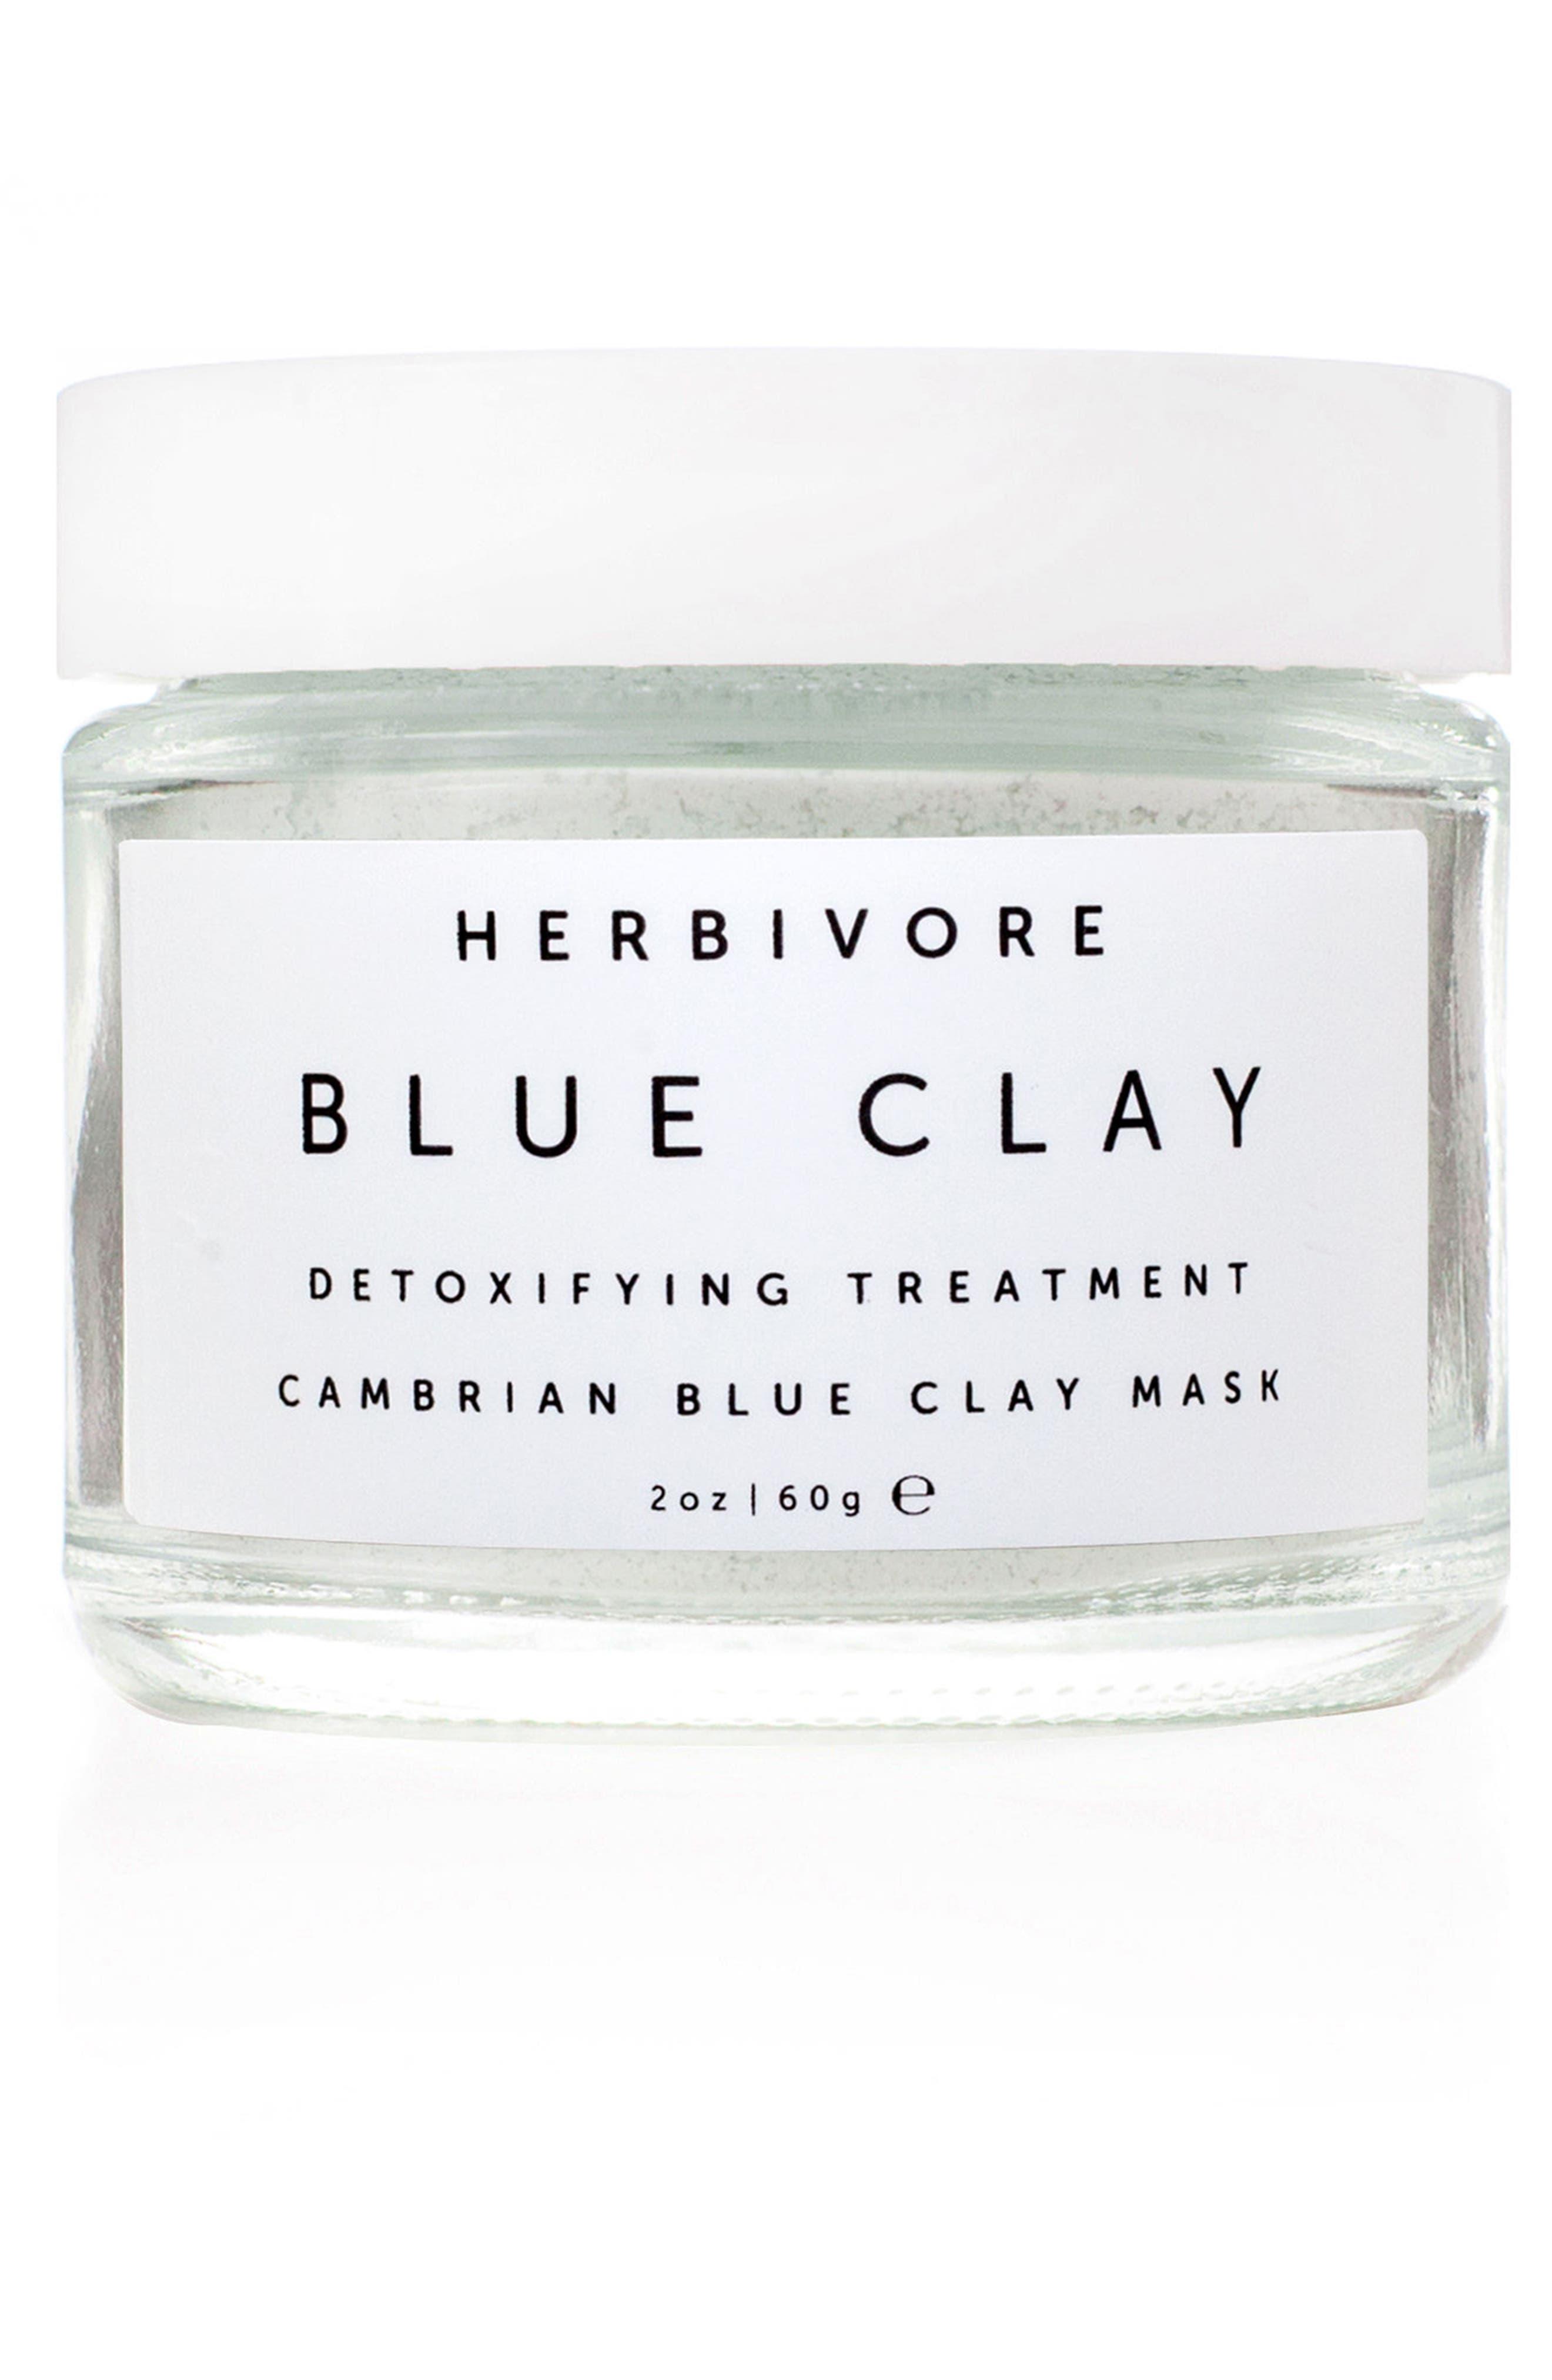 Blue Clay Spot Treatment Mask,                         Main,                         color, No Color